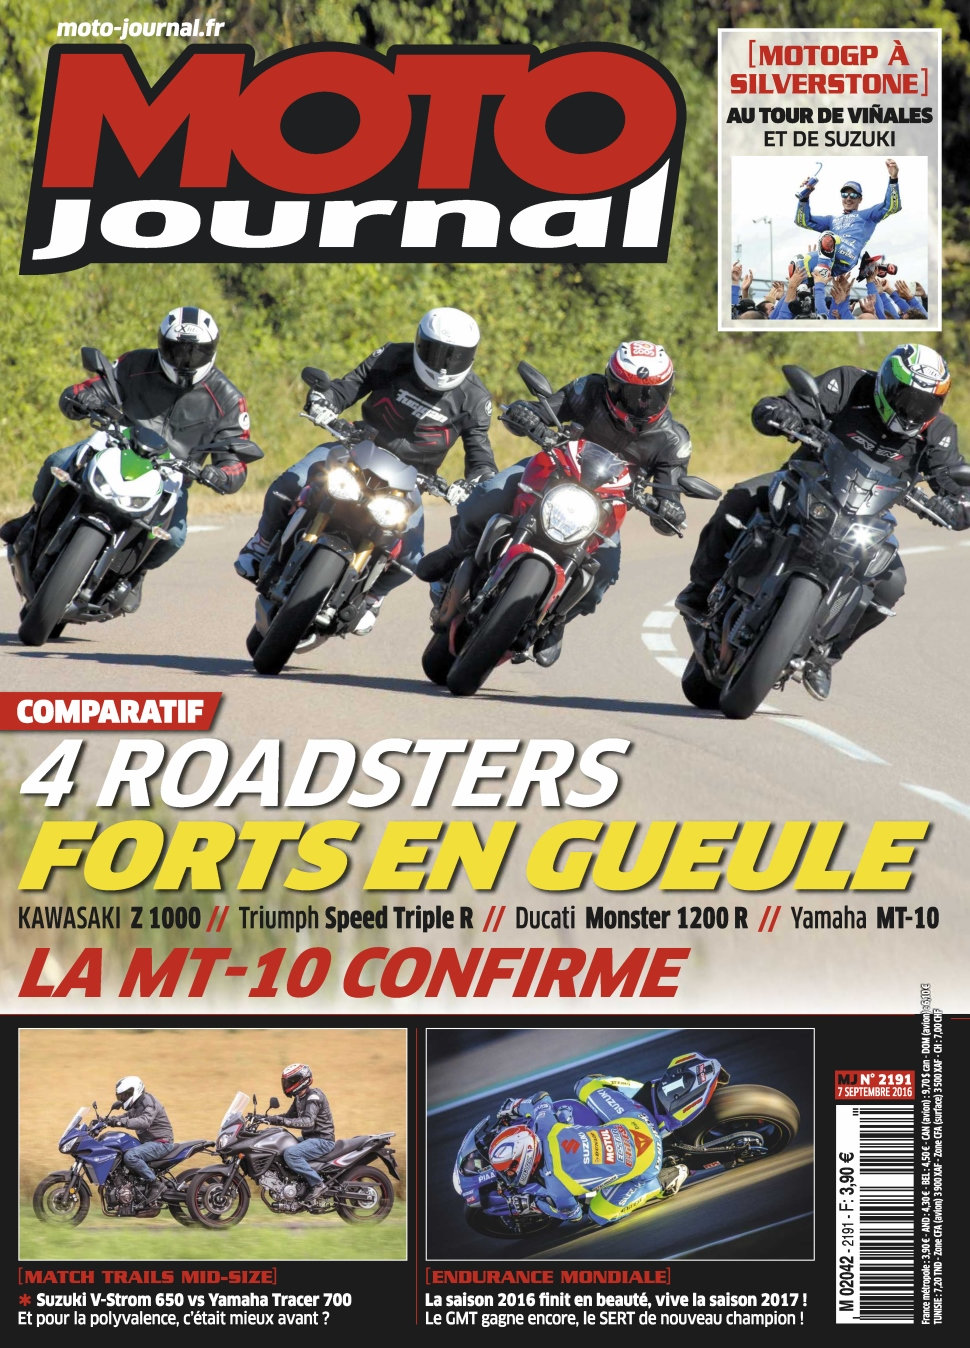 Moto Journal N°2191 - 7 Septembre 2016